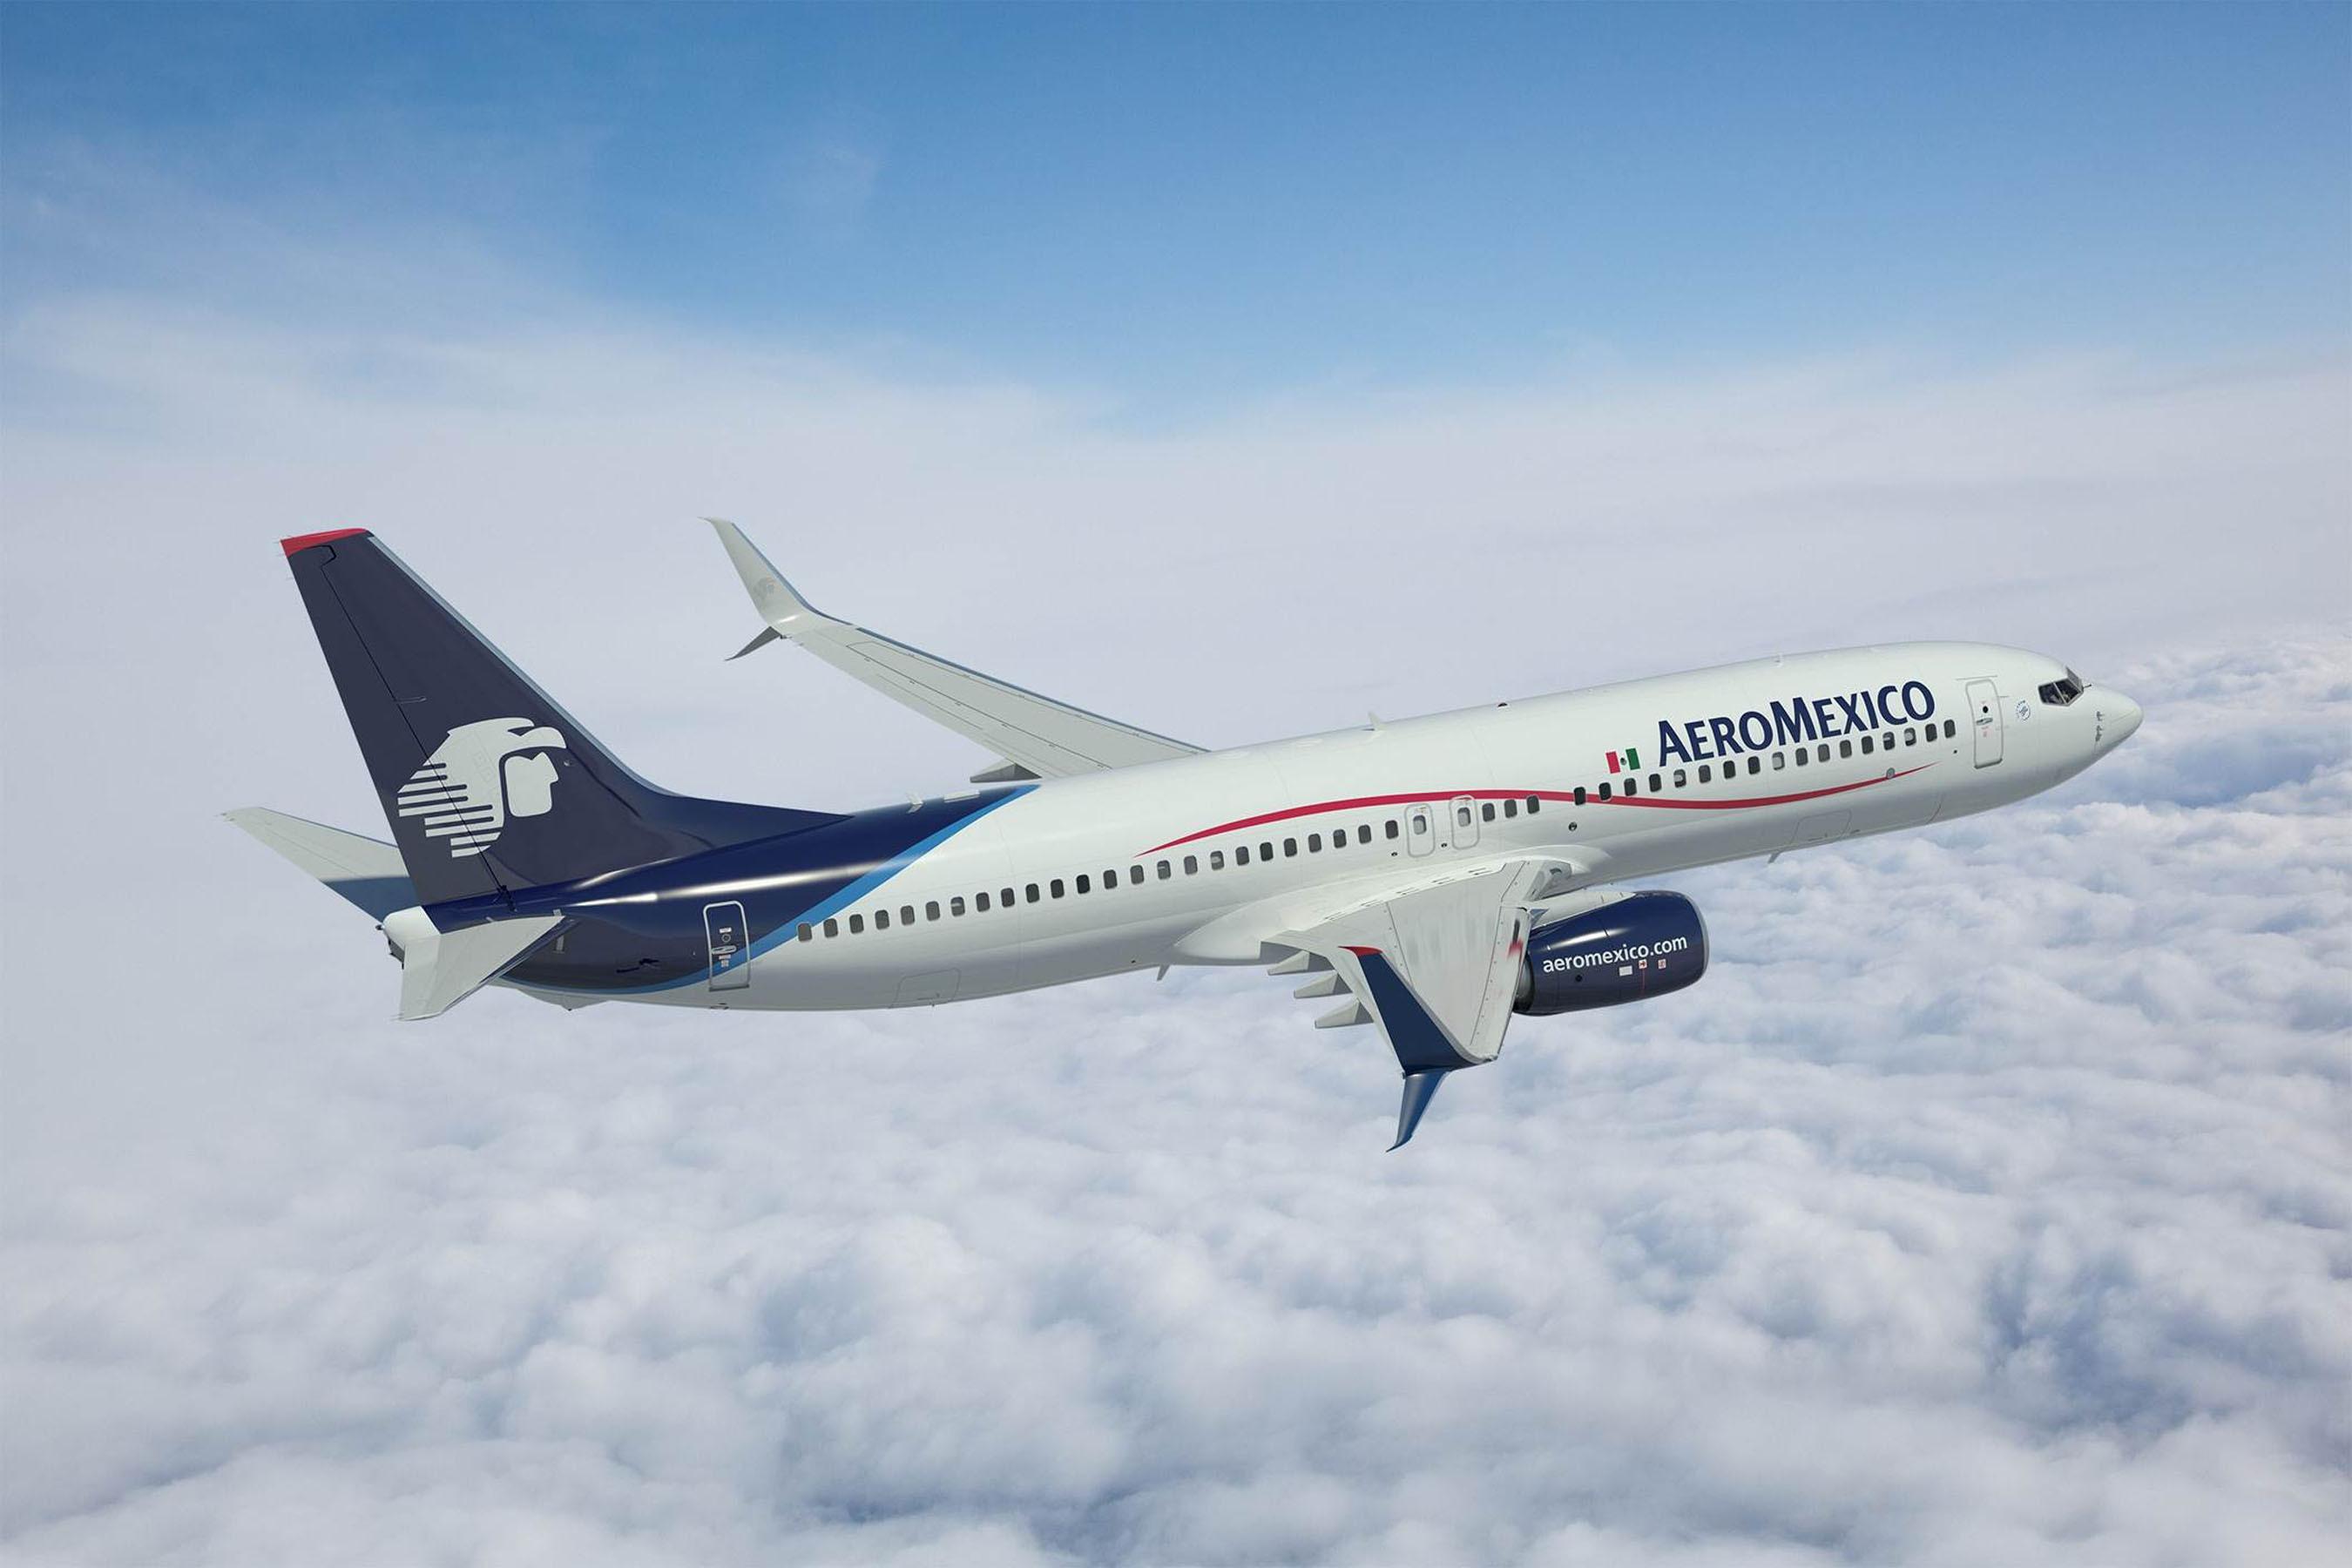 Rendering of Aeromexico 737-800 with Split Scimitar Winglets. (PRNewsFoto/Aviation Partners Boeing) (PRNewsFoto/AVIATION PARTNERS BOEING)